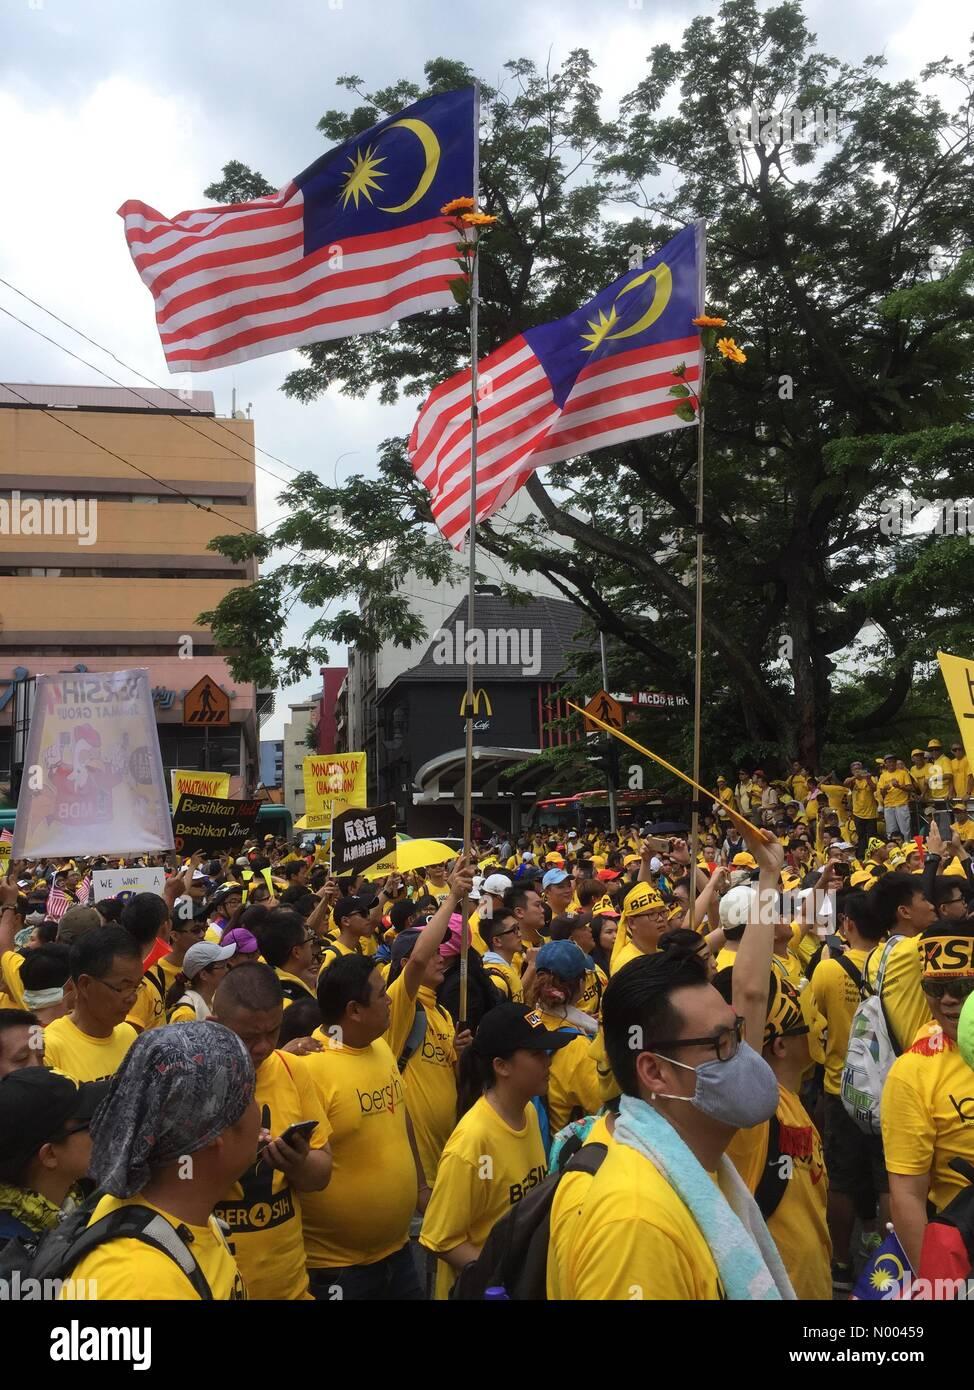 kuala lumpur, malaysia 29 august 2015 supporters of bersih 4 0kuala lumpur, malaysia 29 august 2015 supporters of bersih 4 0 rally for free and fair elections credit chung jin mac stockimonews alamy live news